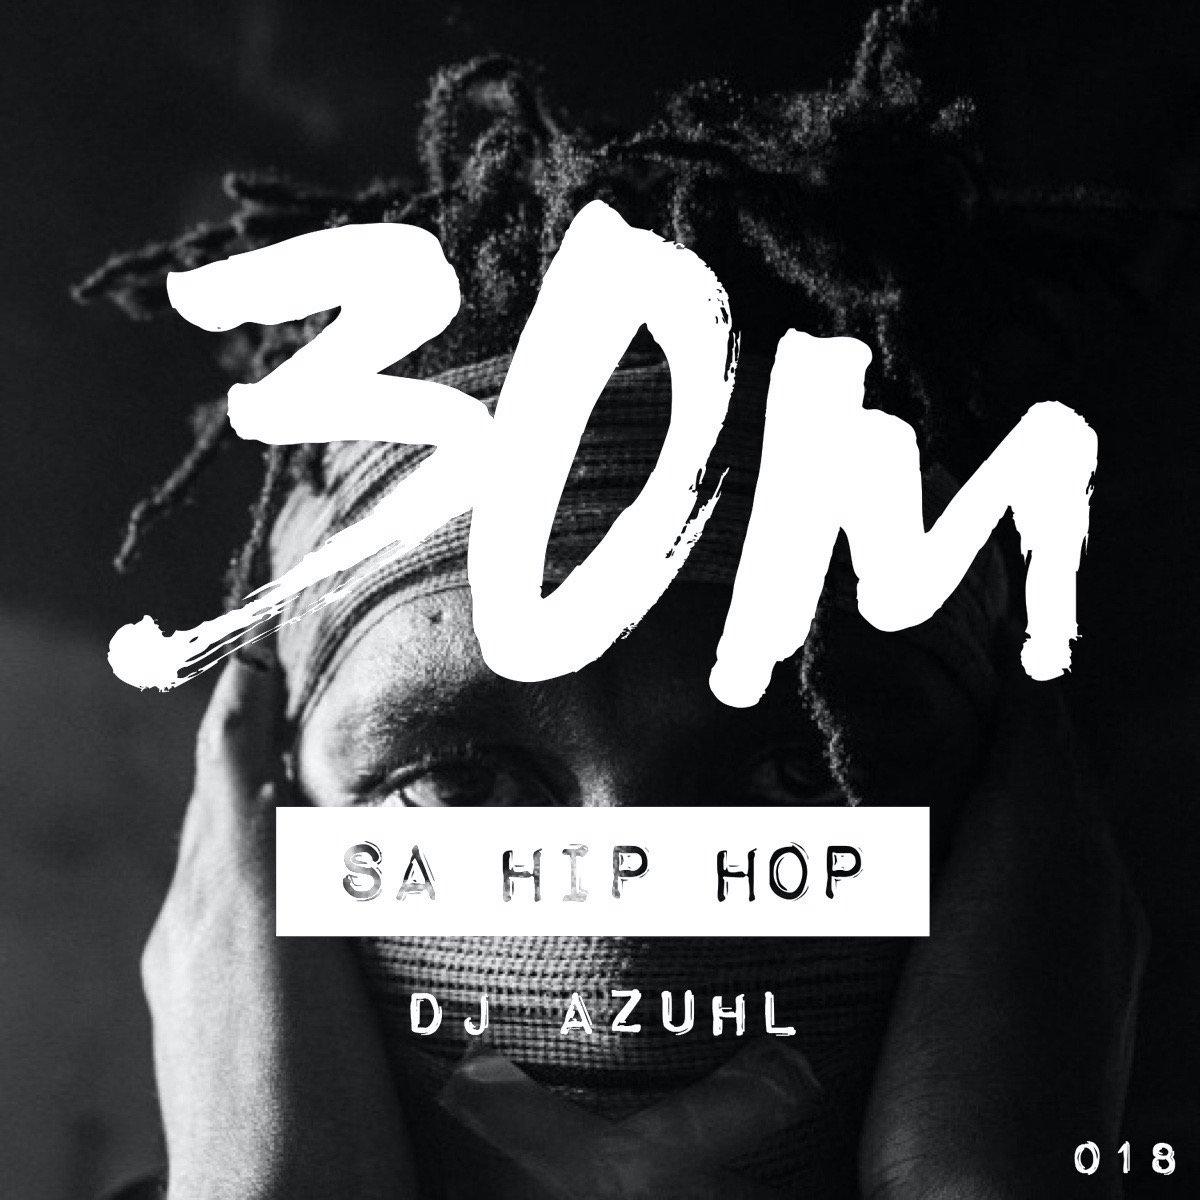 018: SA Hip Hop - DJ Azuhl (Cape Town)